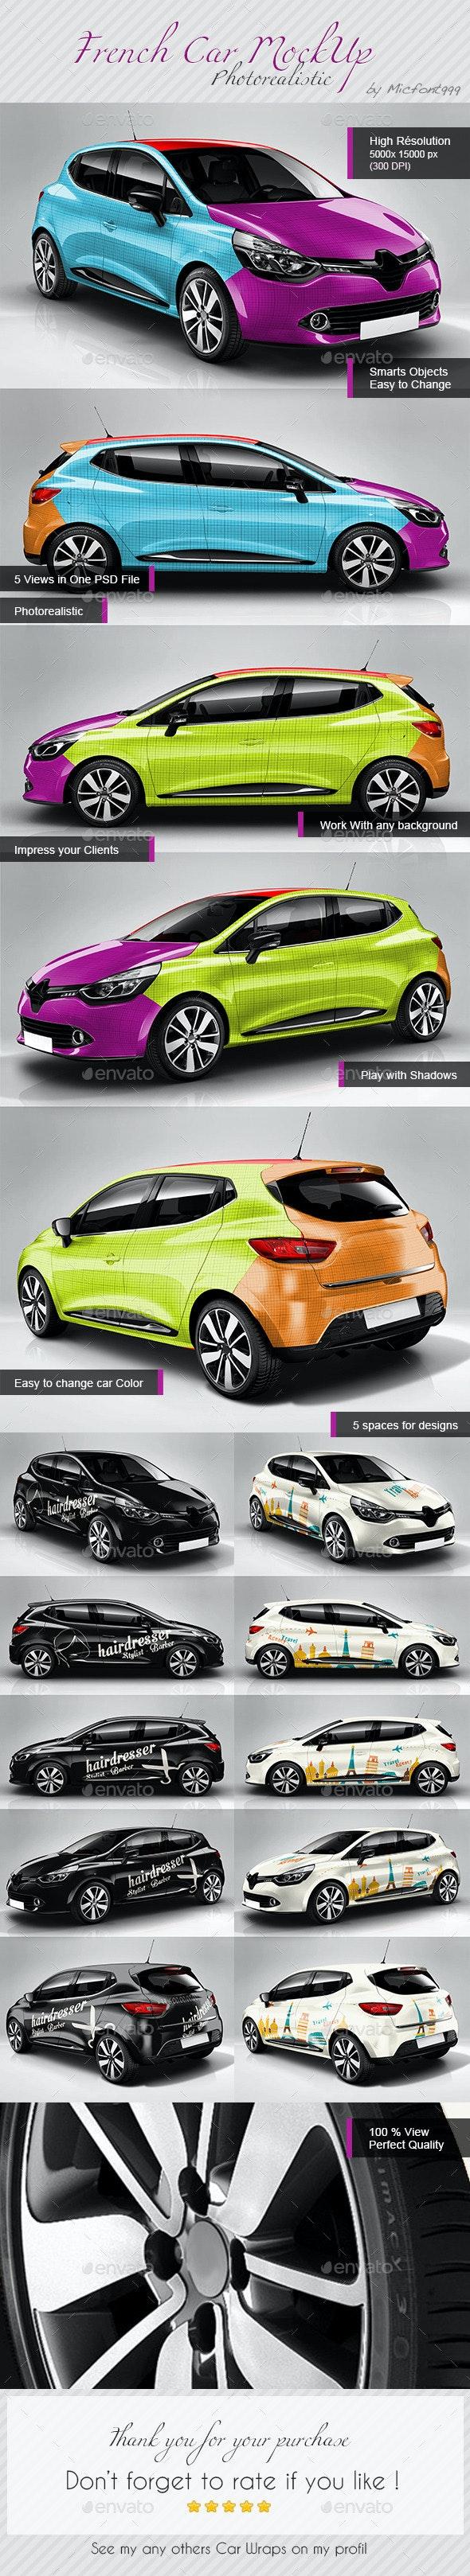 Photorealistic Popular French Car Mock-up - Vehicle Wraps Print